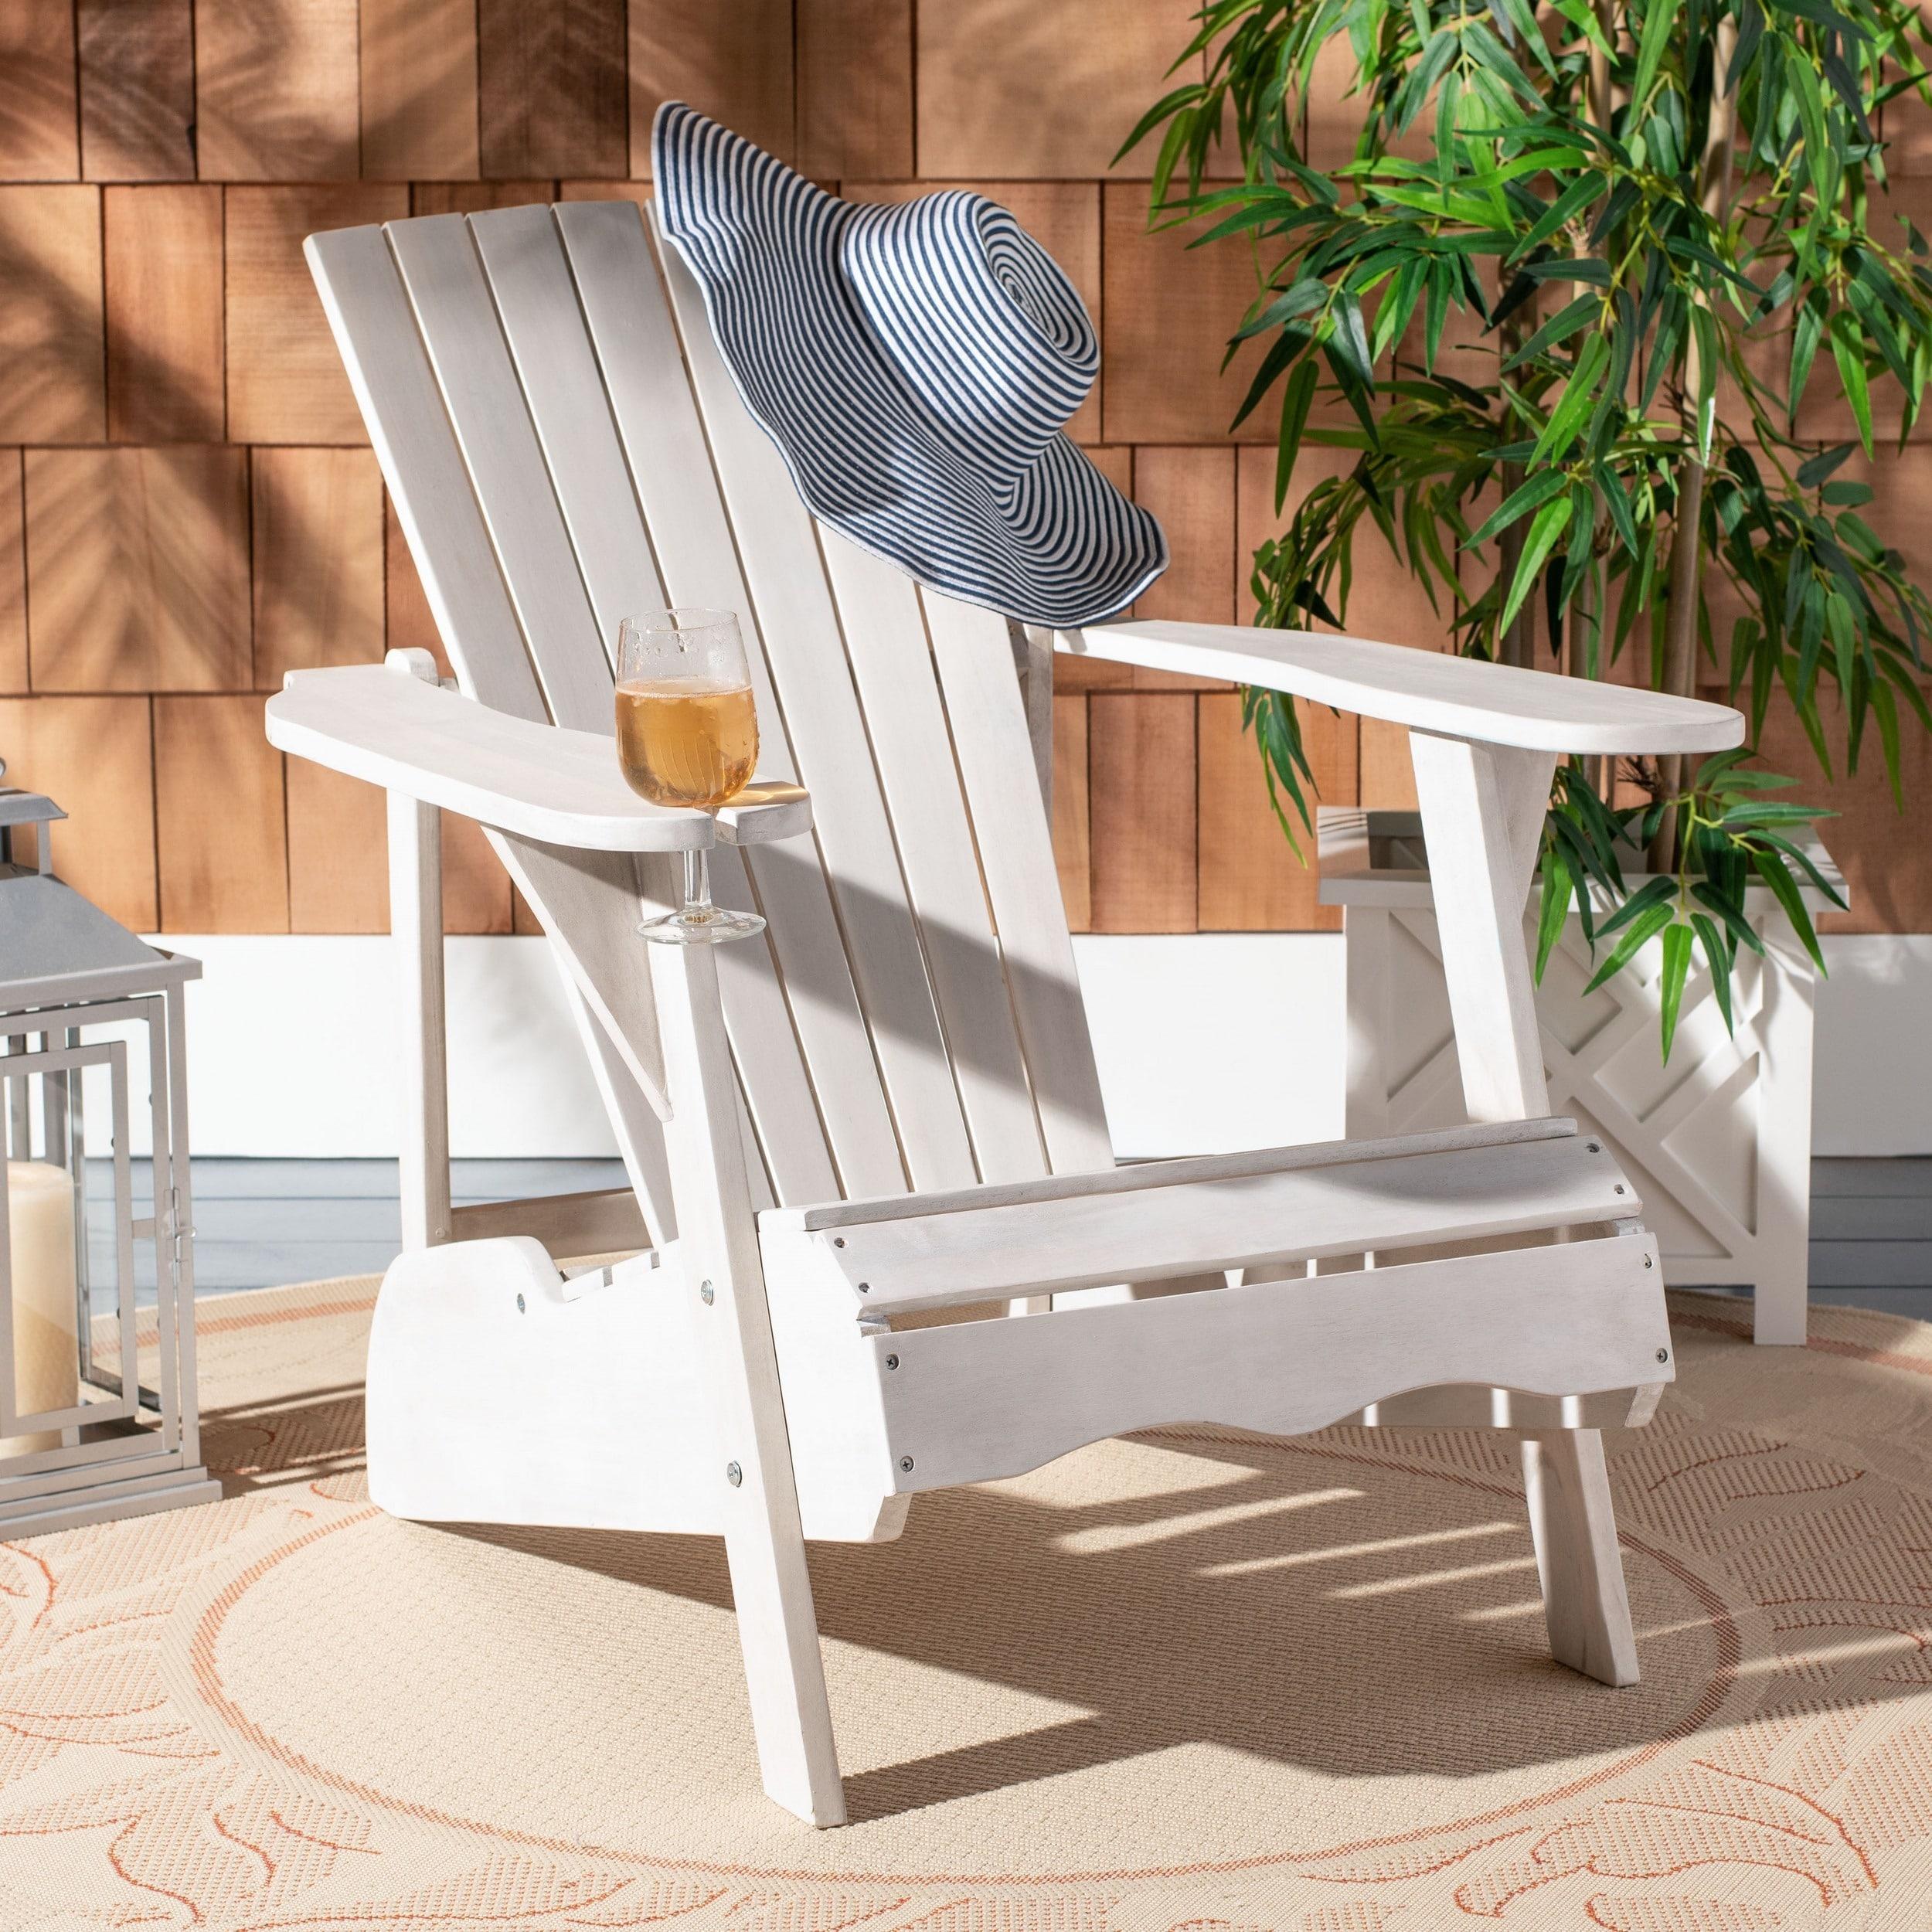 Heavy Duty Sun Lounger, Shop Safavieh Outdoor Living Vista Antiqued White Acacia Wood Adirondack Chair Overstock 9126371